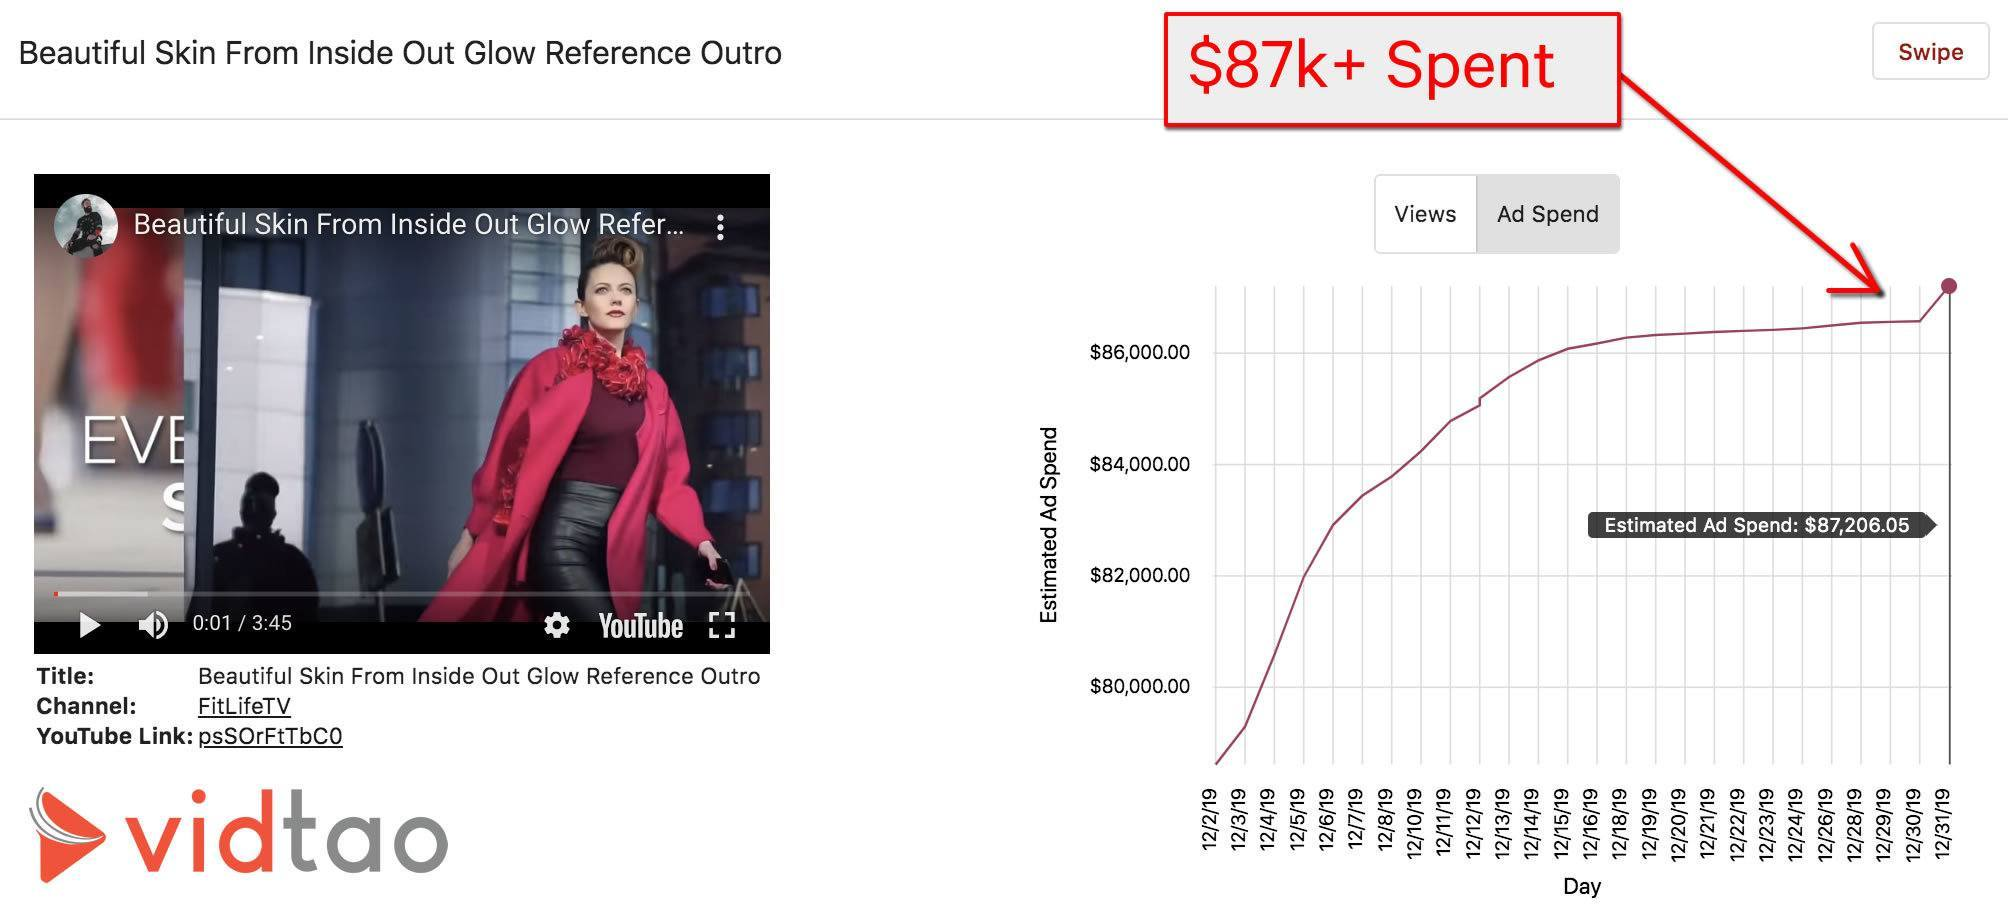 youtube-ad-spy-tool-screenshot-organifi-screenshot-20200101-1